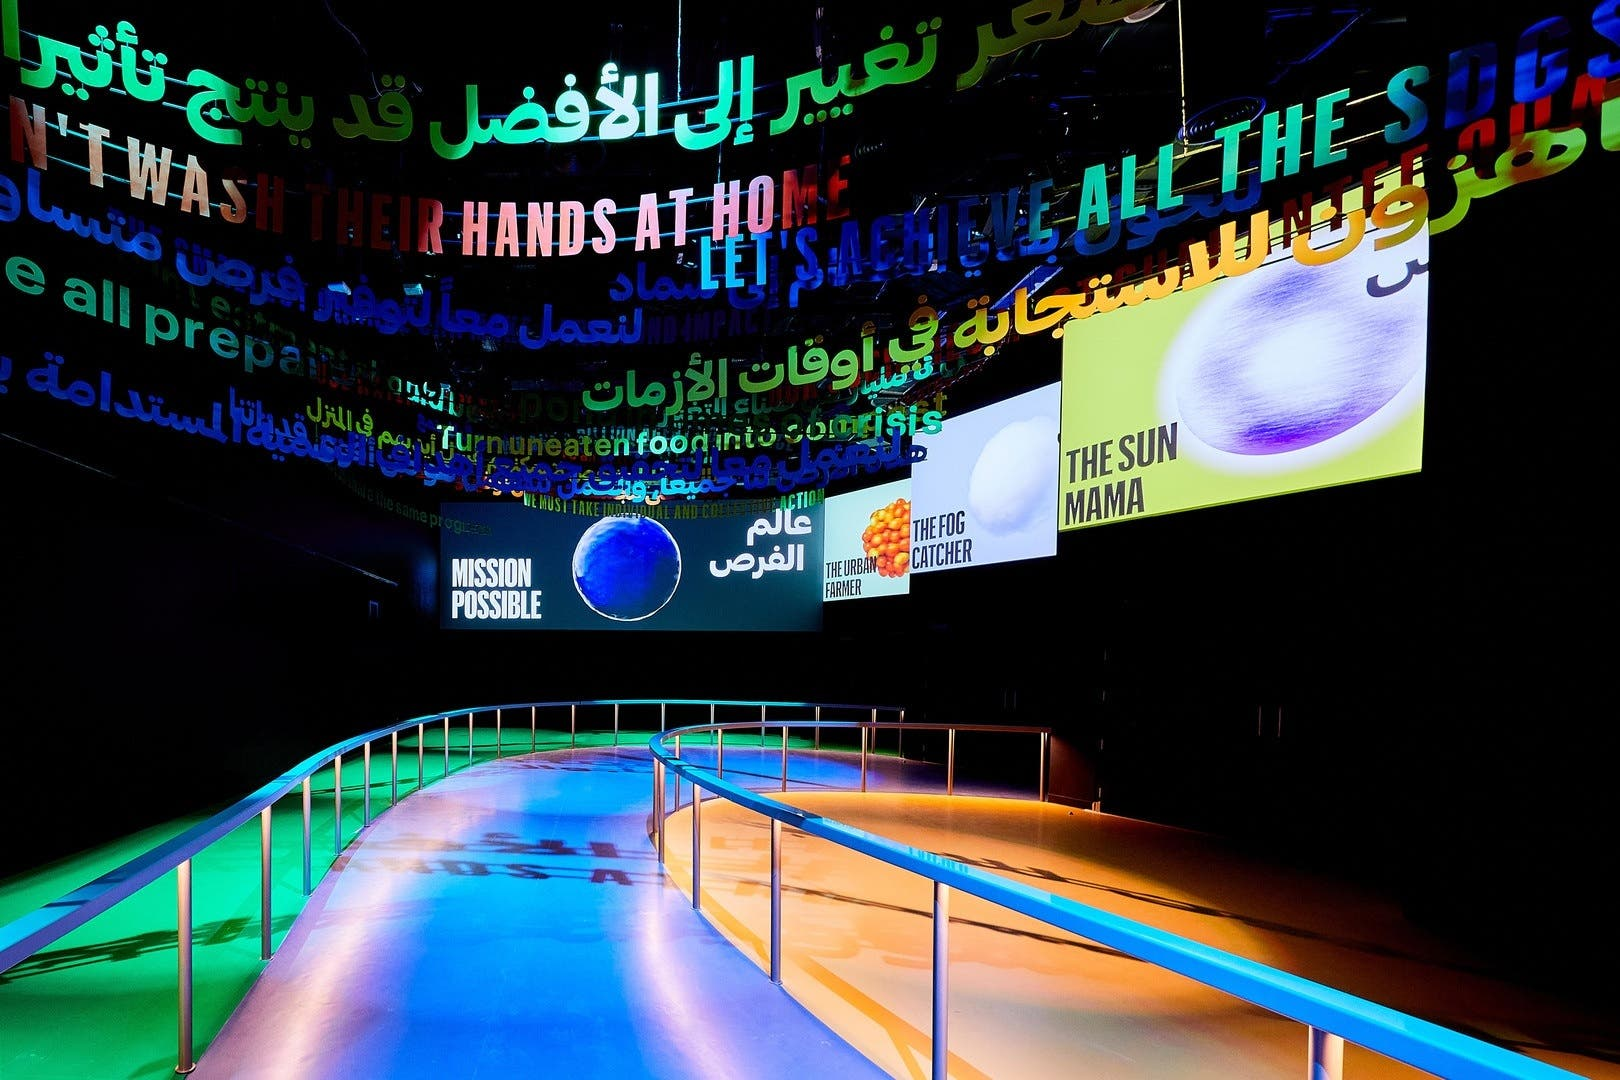 The Opportunity Pavilion at Dubai Expo 2020. (Supplied: Dubai Expo 2020)